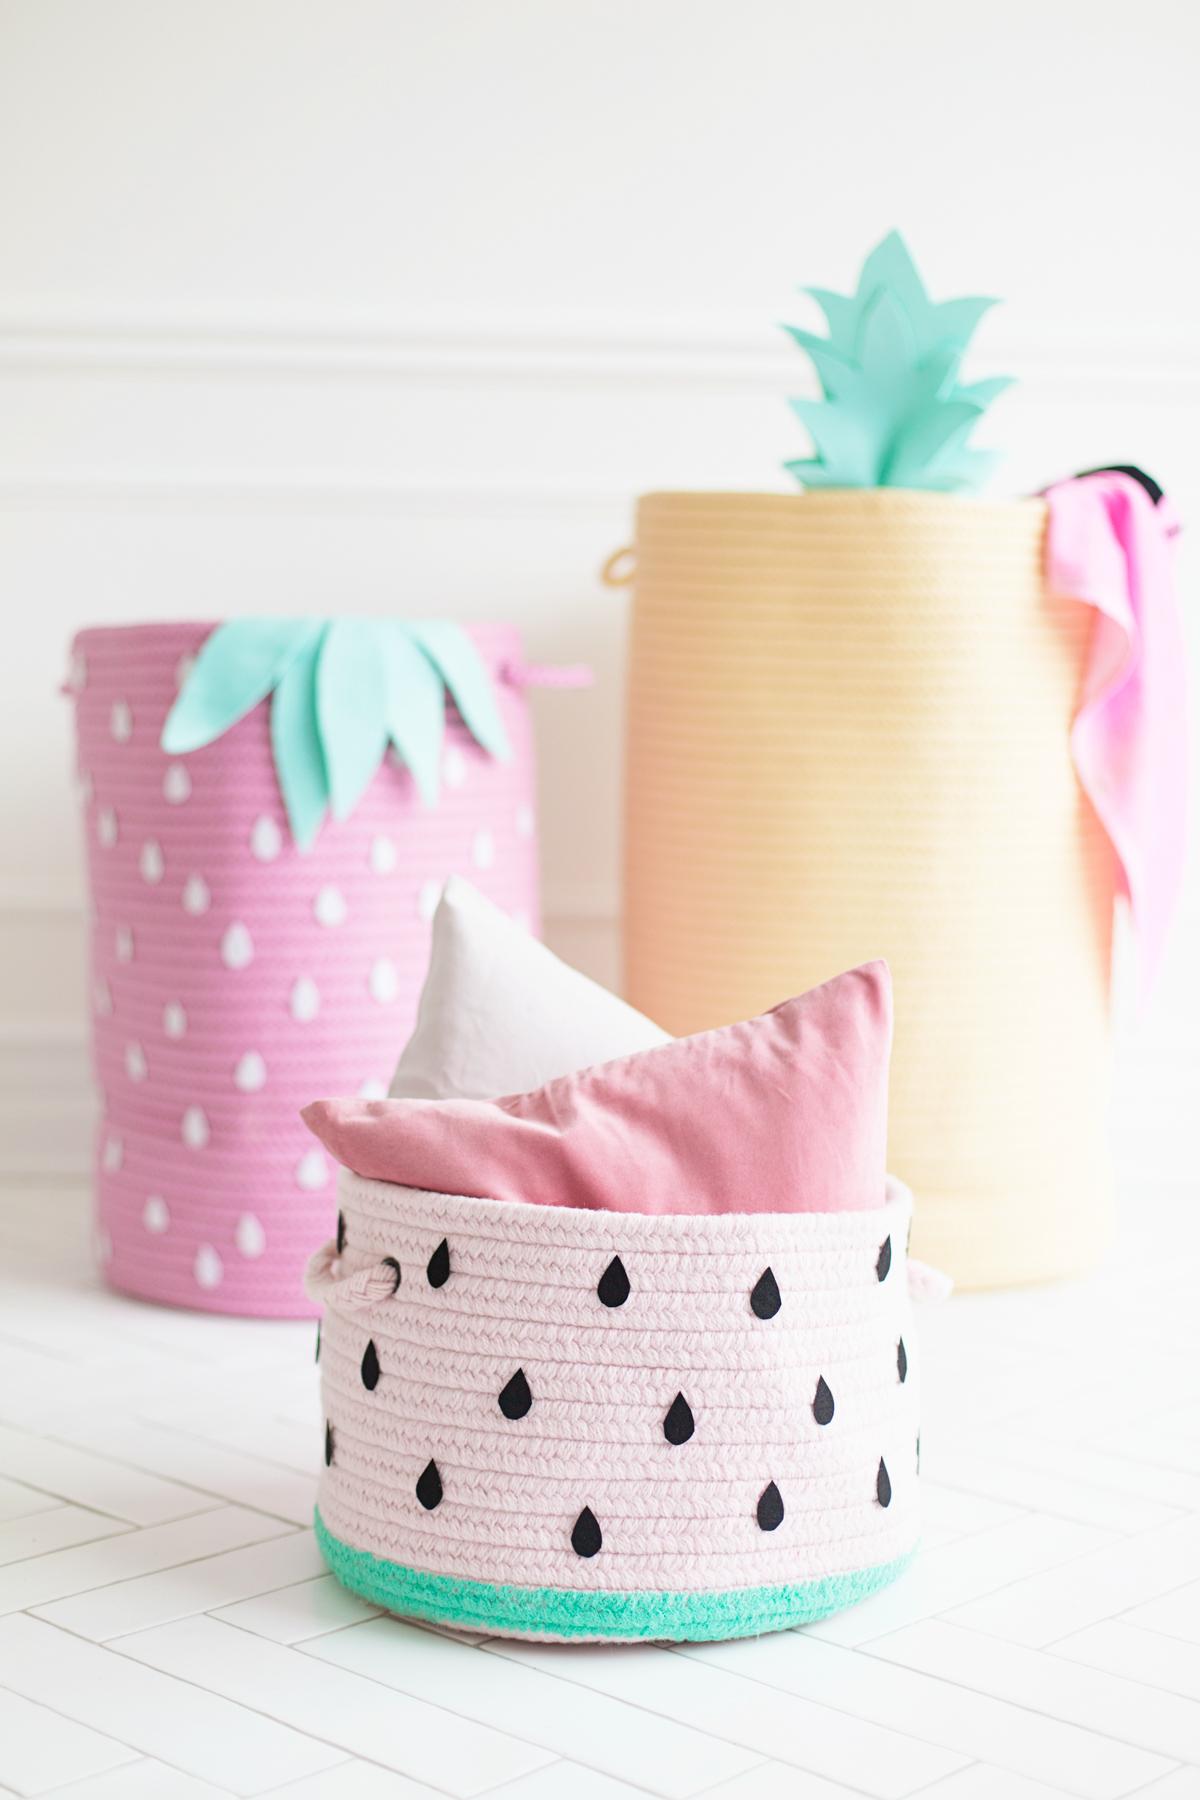 Fruit-inspired-storage-baskets-from-Studio-DIY-34797